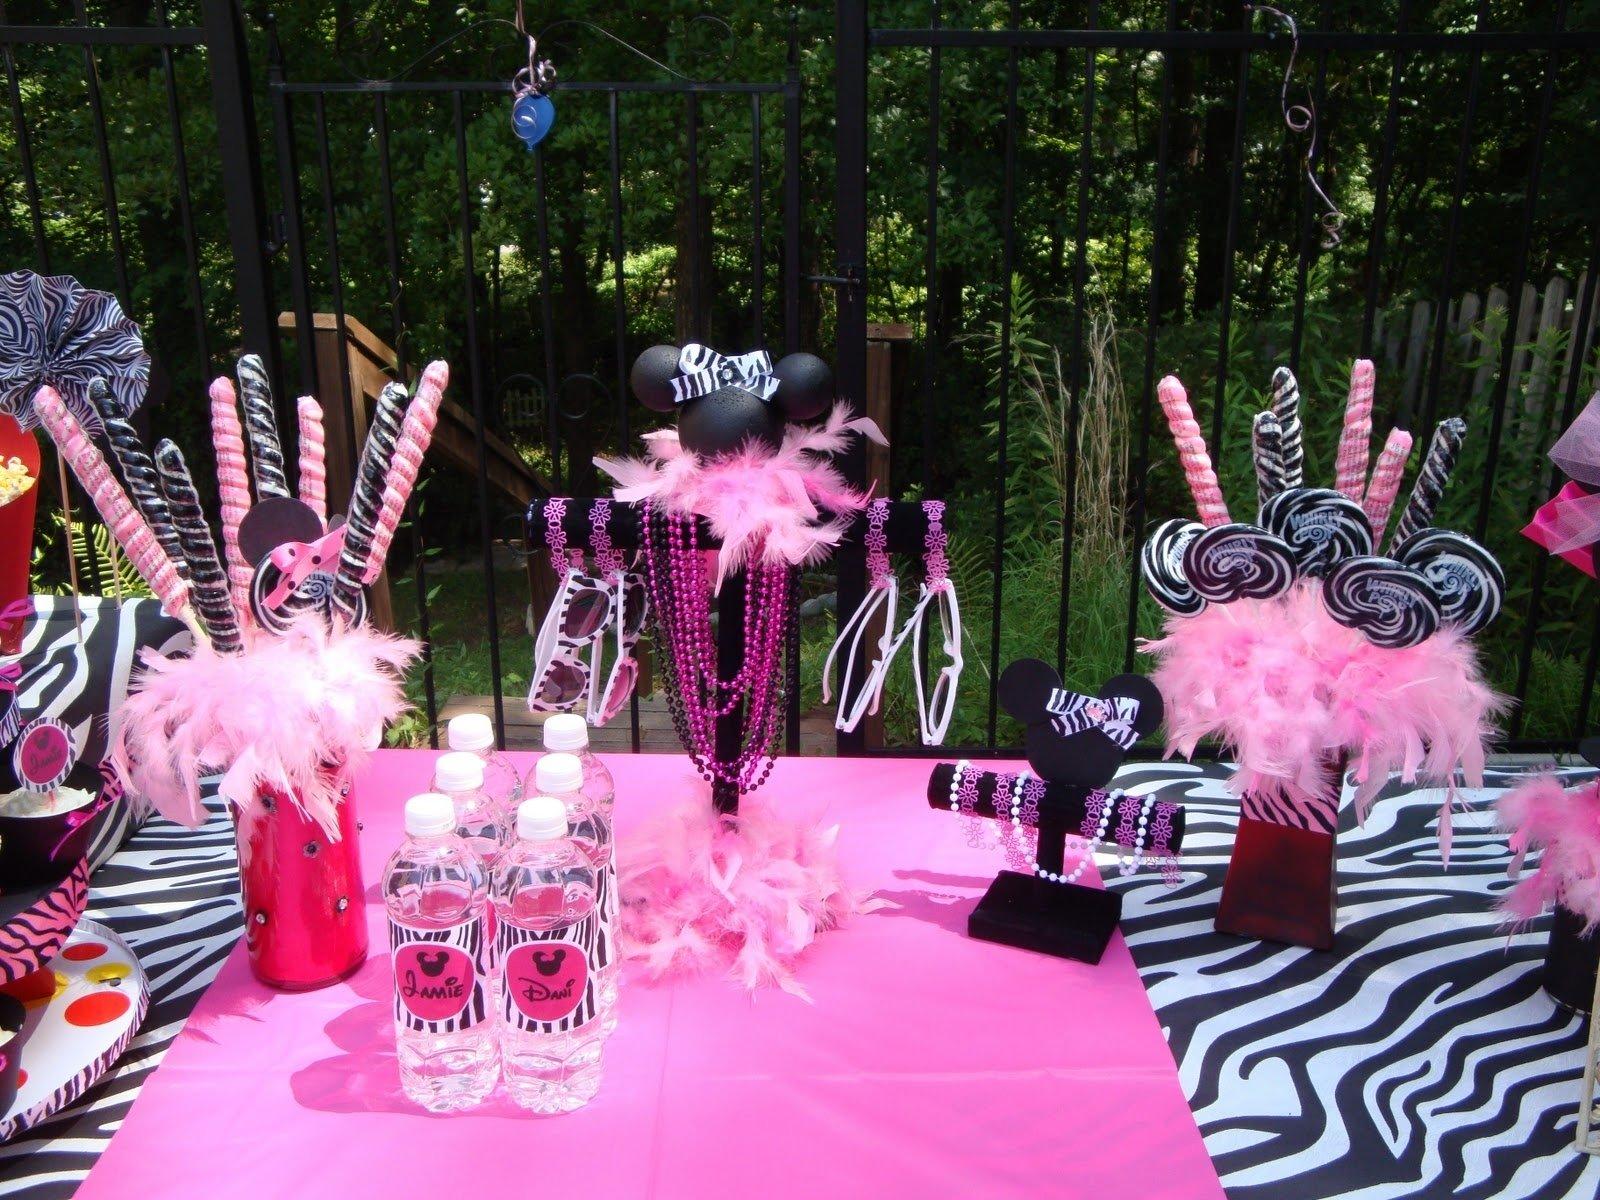 10 Spectacular Zebra Print Party Decoration Ideas pink zebra print party ideas the party people online magazine 2021